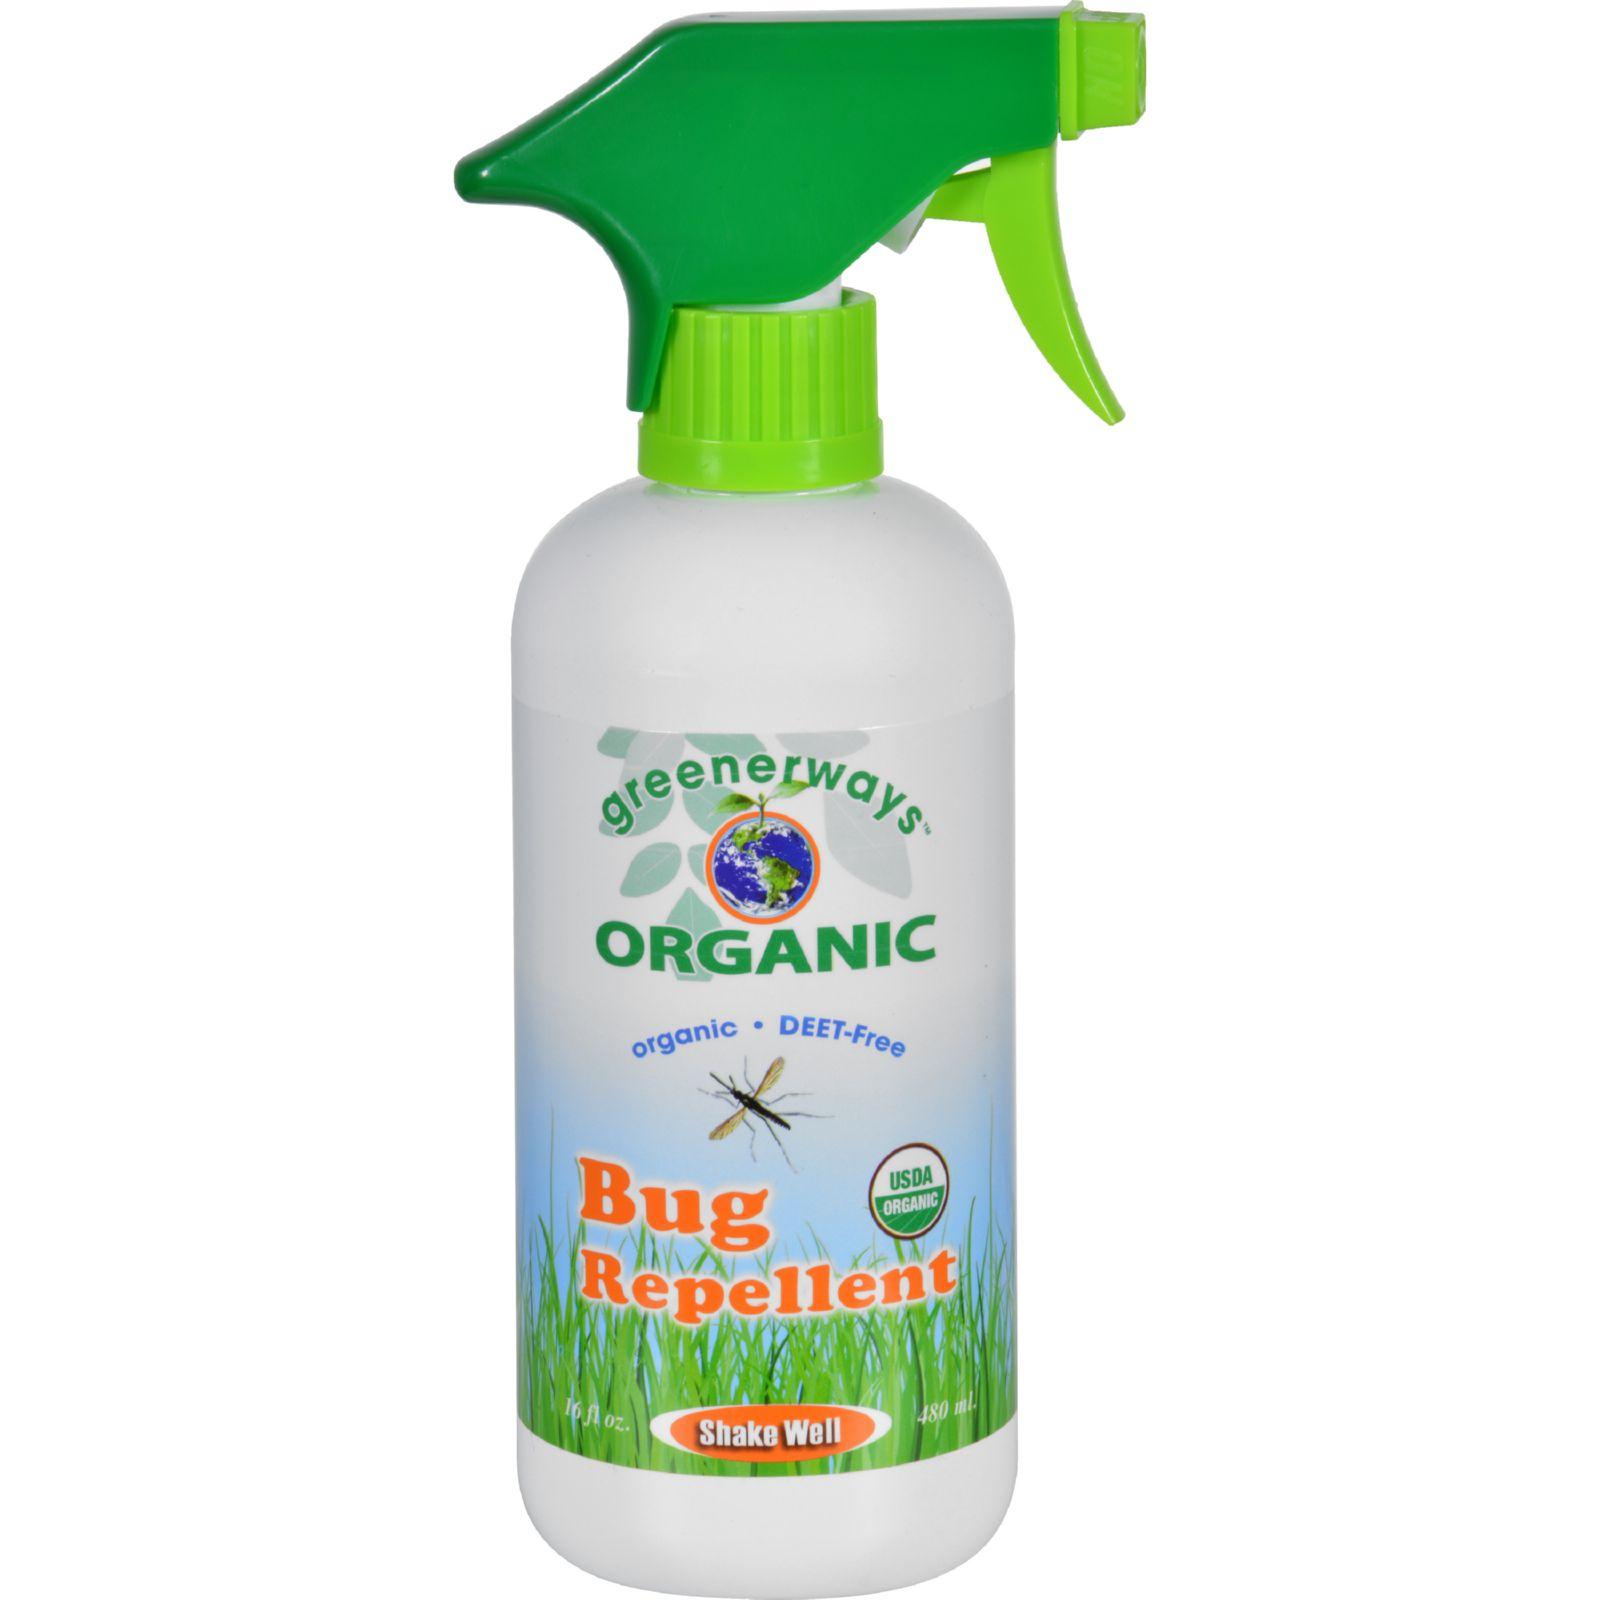 Greenerways Bug Repellent  Organic  Spray  16 oz